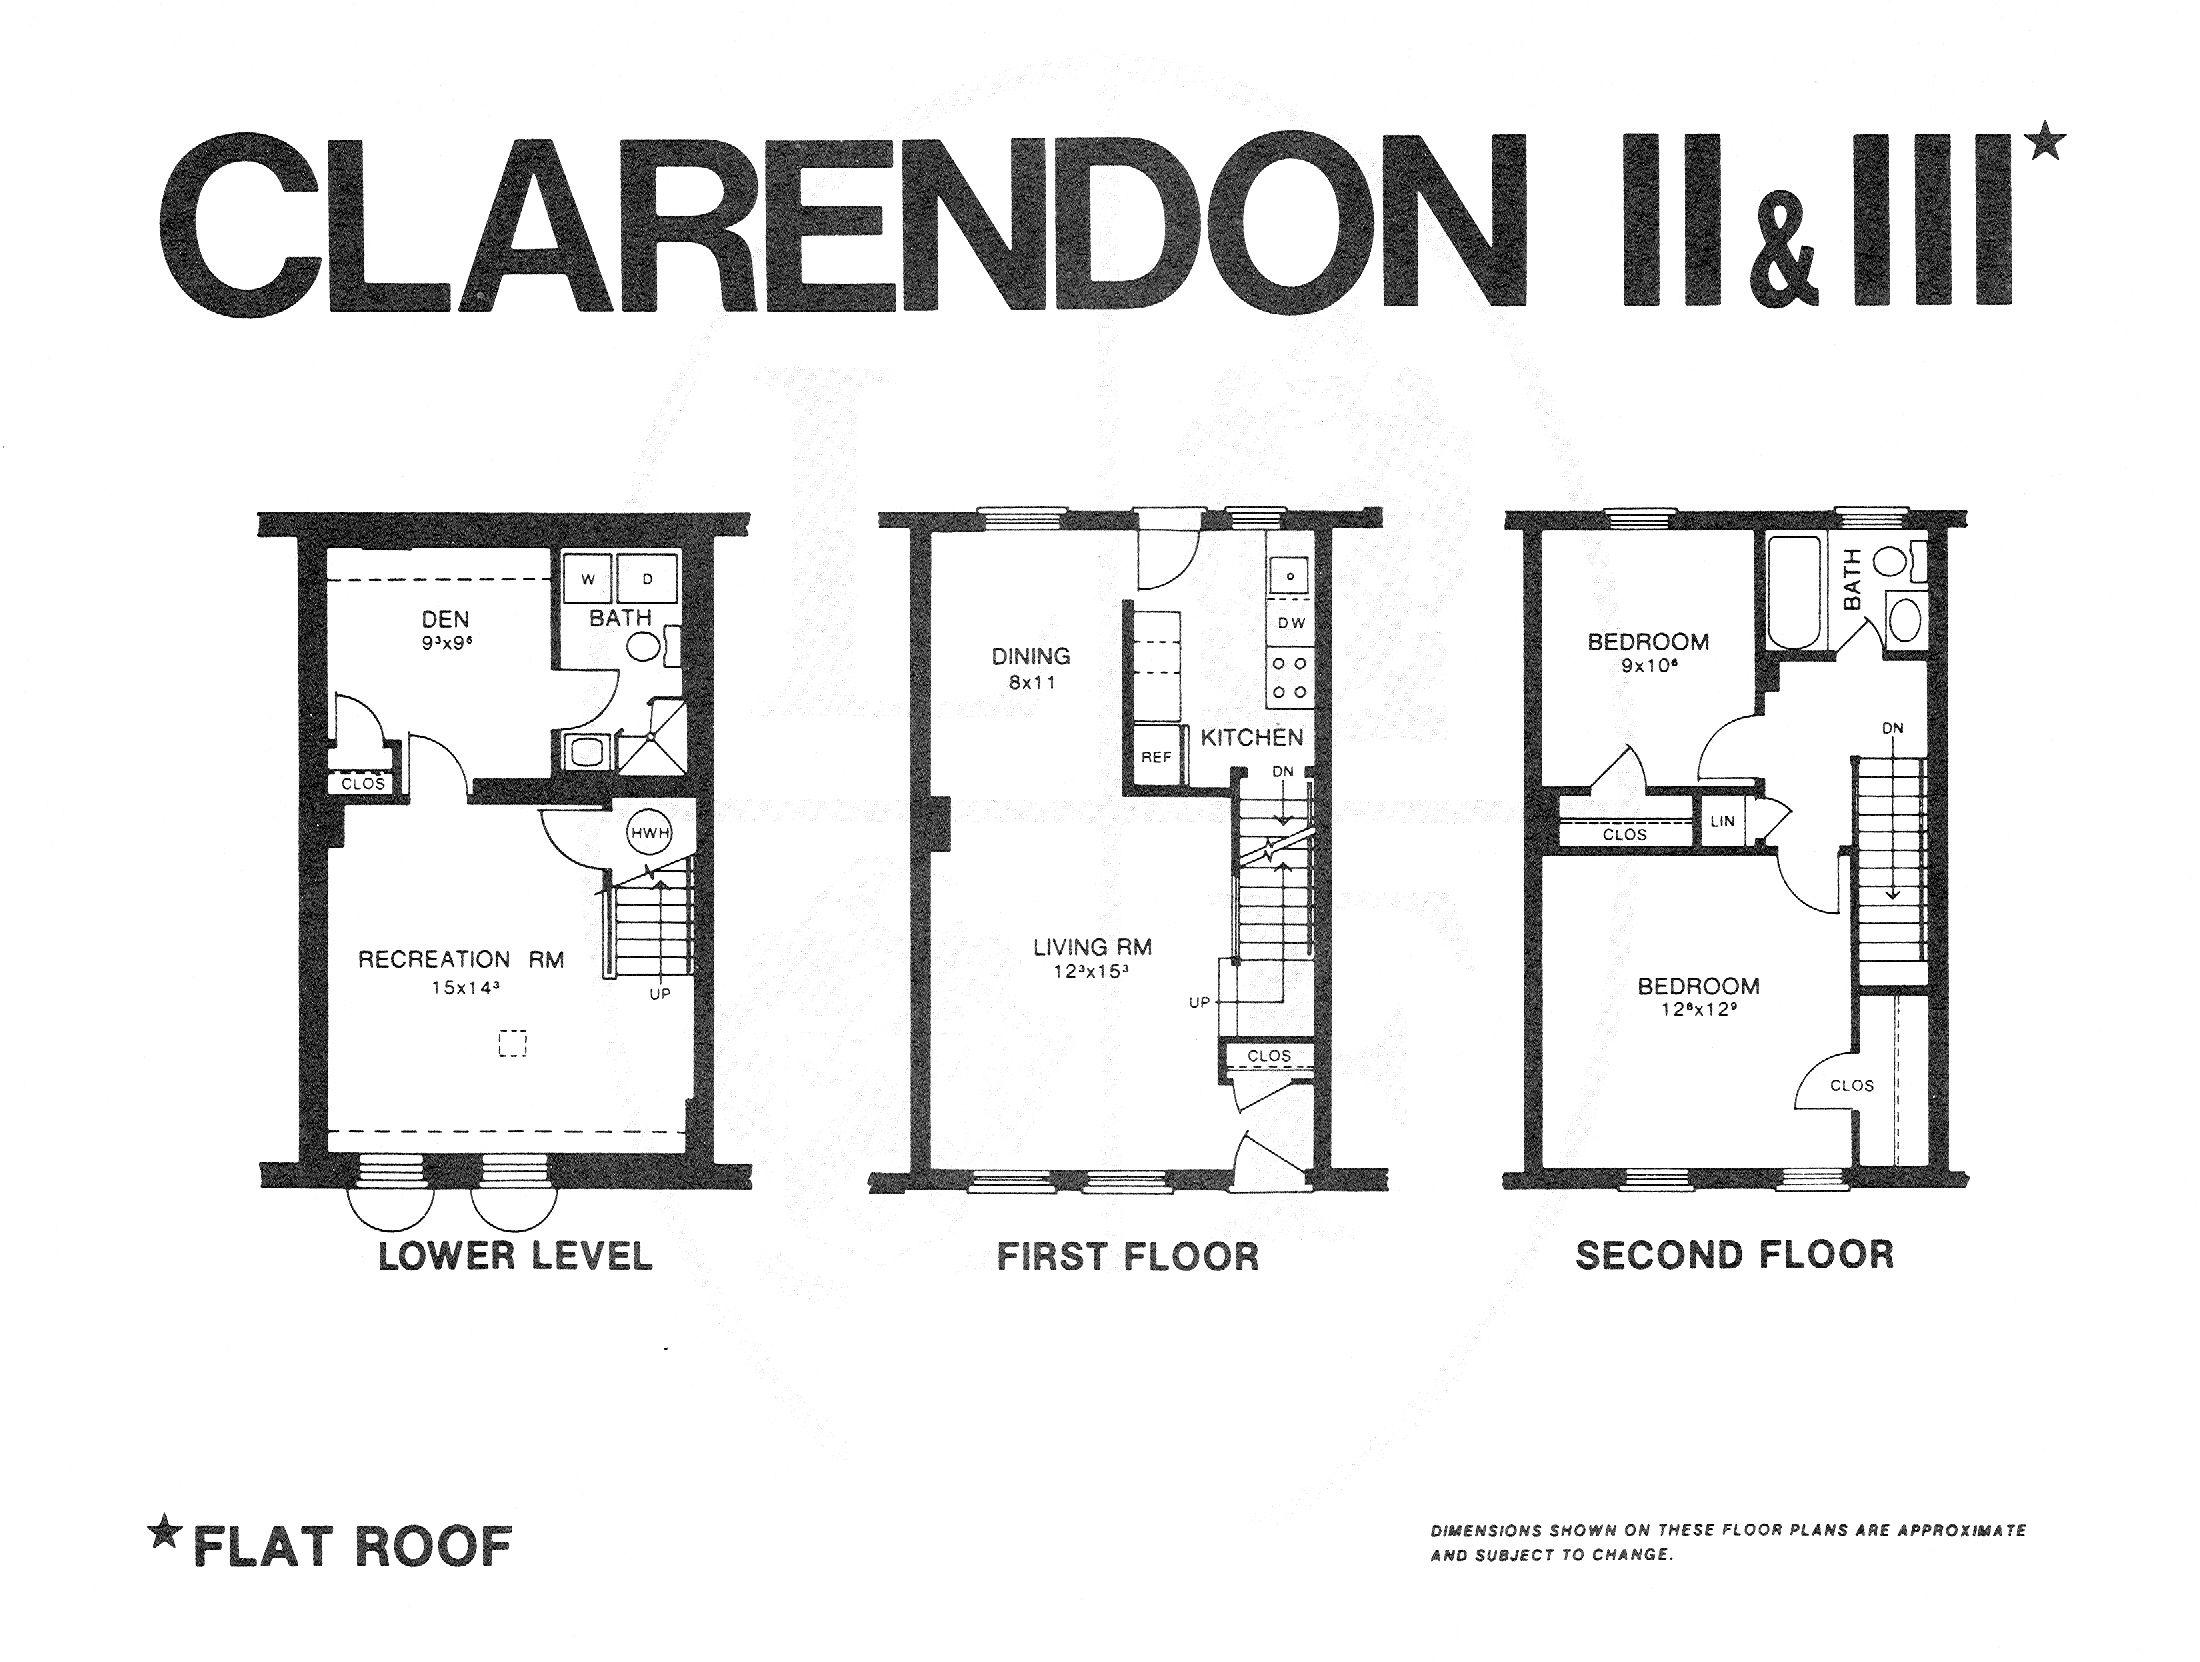 Fairlington Condominium Clarendon Ii Iii Models John Mentis Realtor Clarendon Real Estate Agent Flat Roof